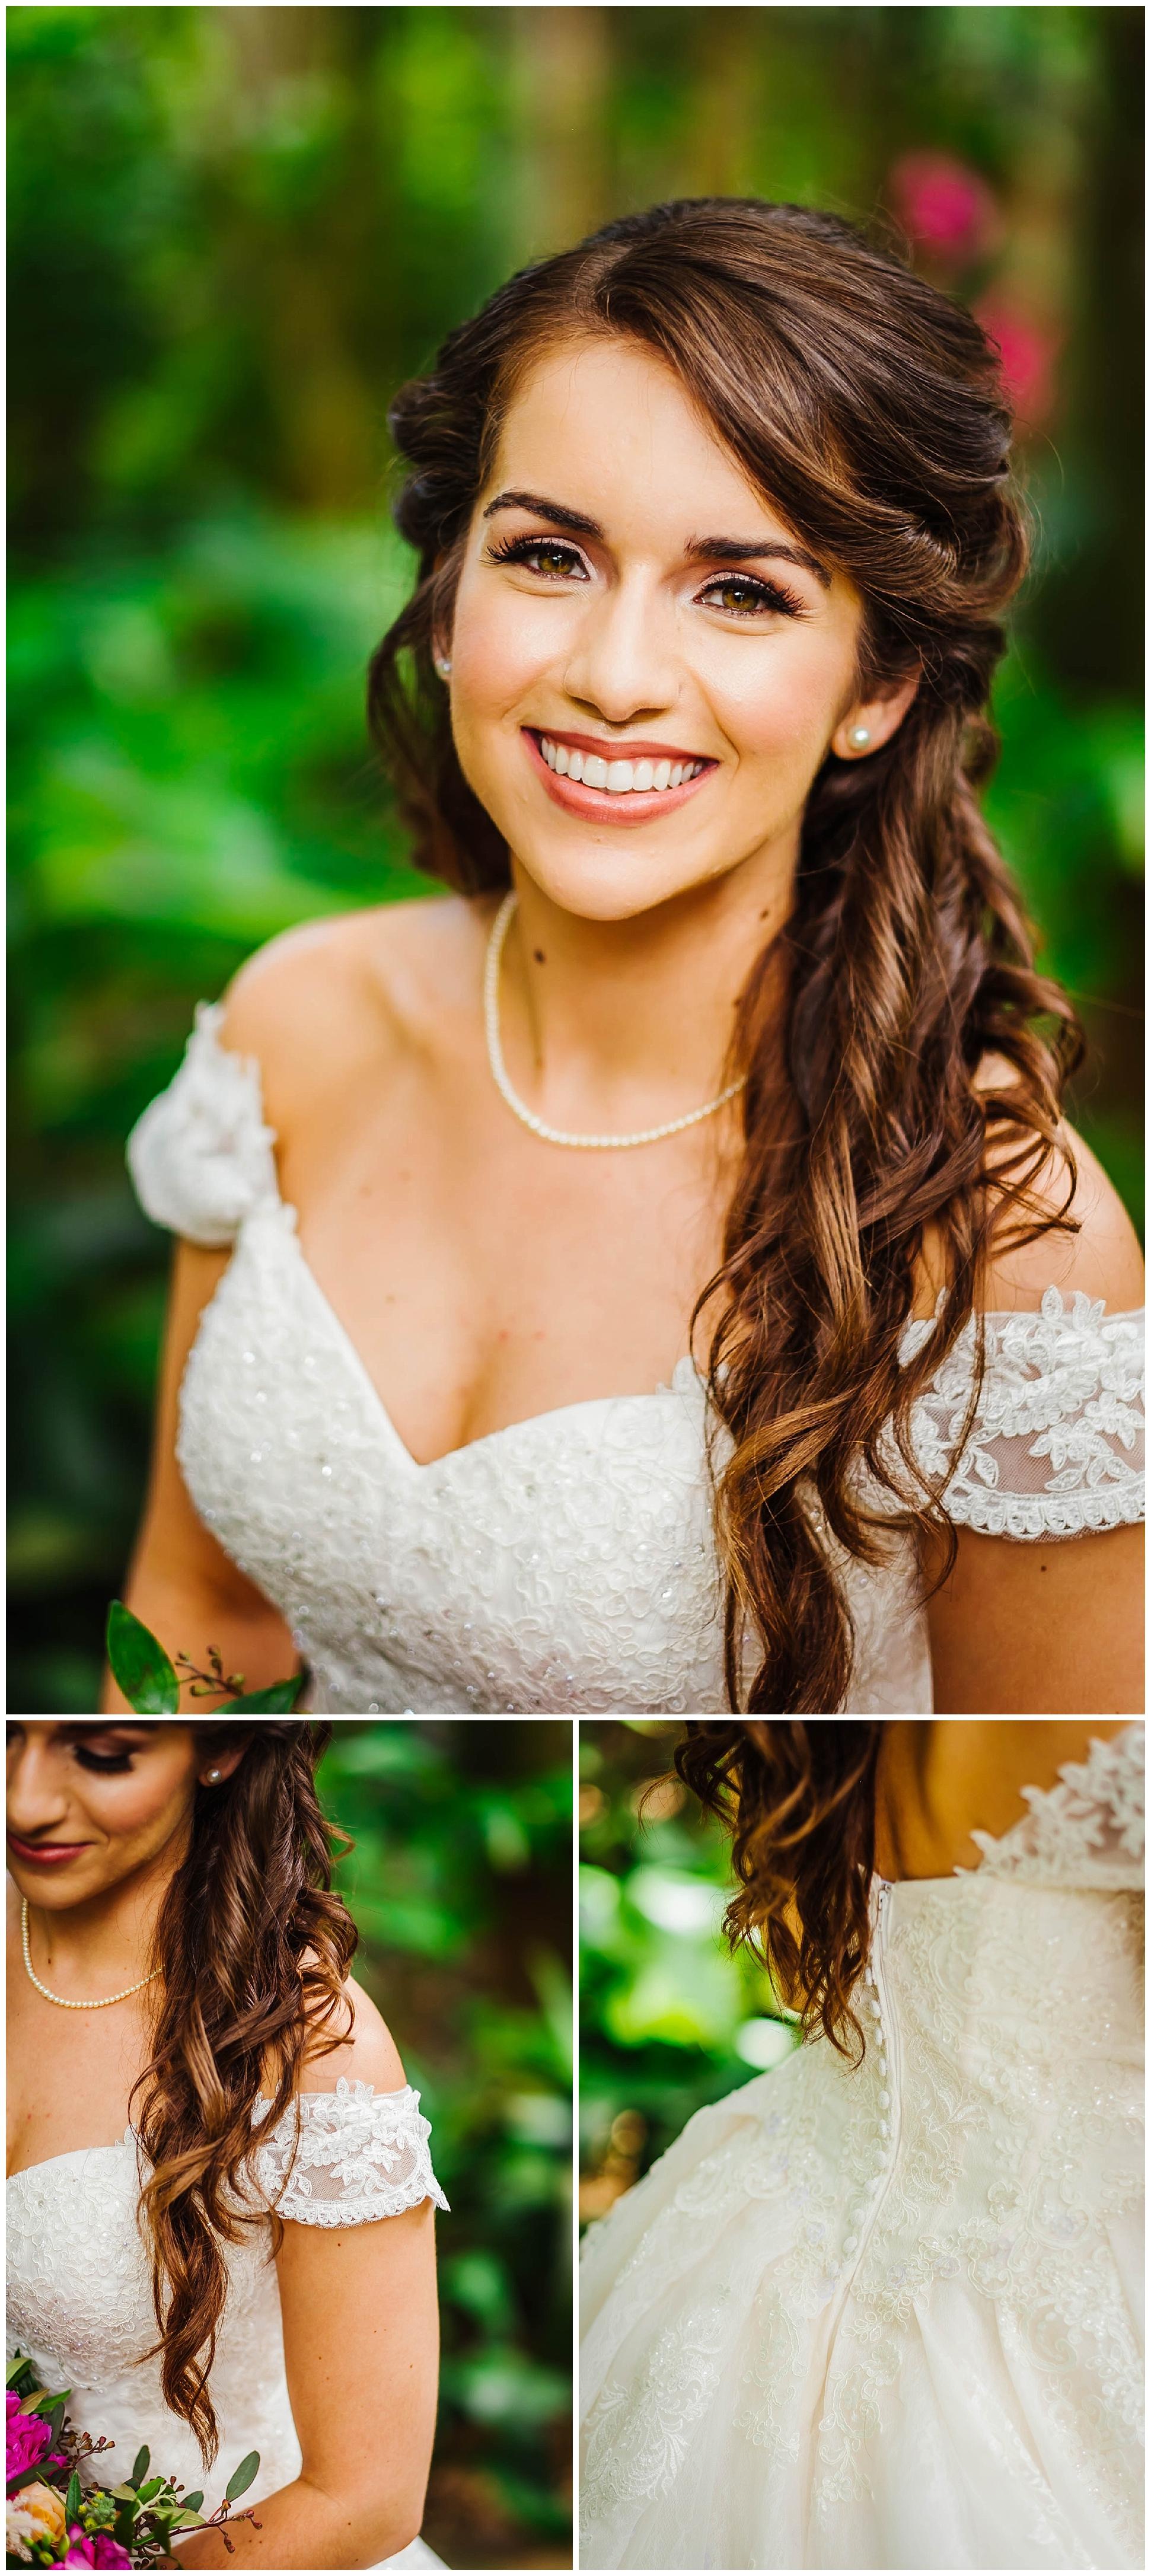 st-pete-wedding-photographer-sunken-gardens-crystal-ballroom-princess-dancer_0130.jpg